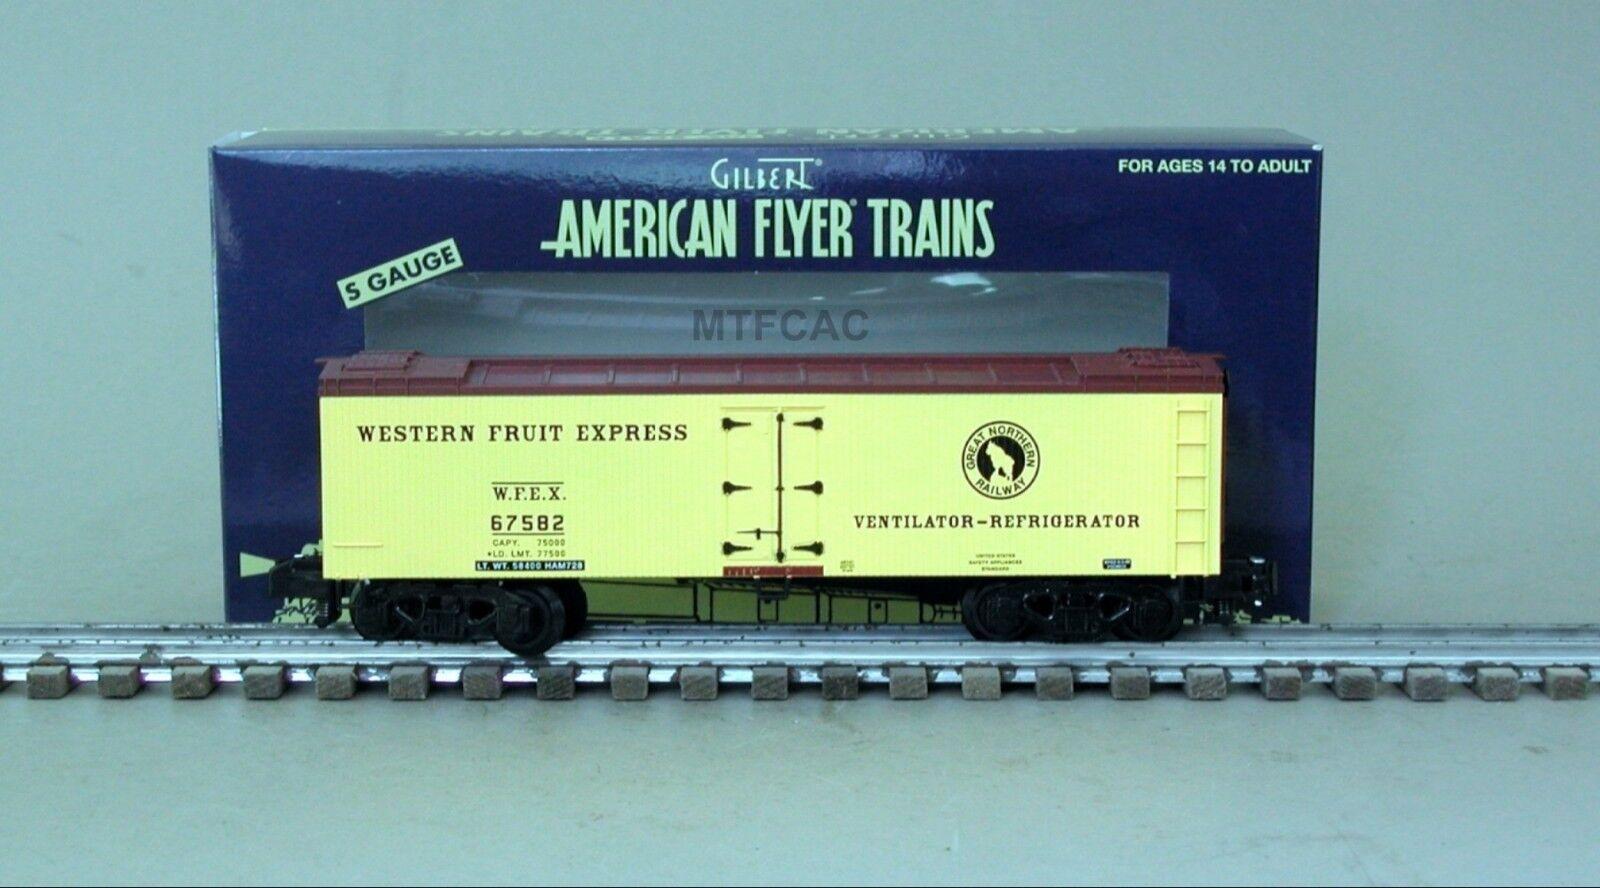 American Flyer 6-44141 Western Fruit Express Wood Side Refrigerator Car 67582